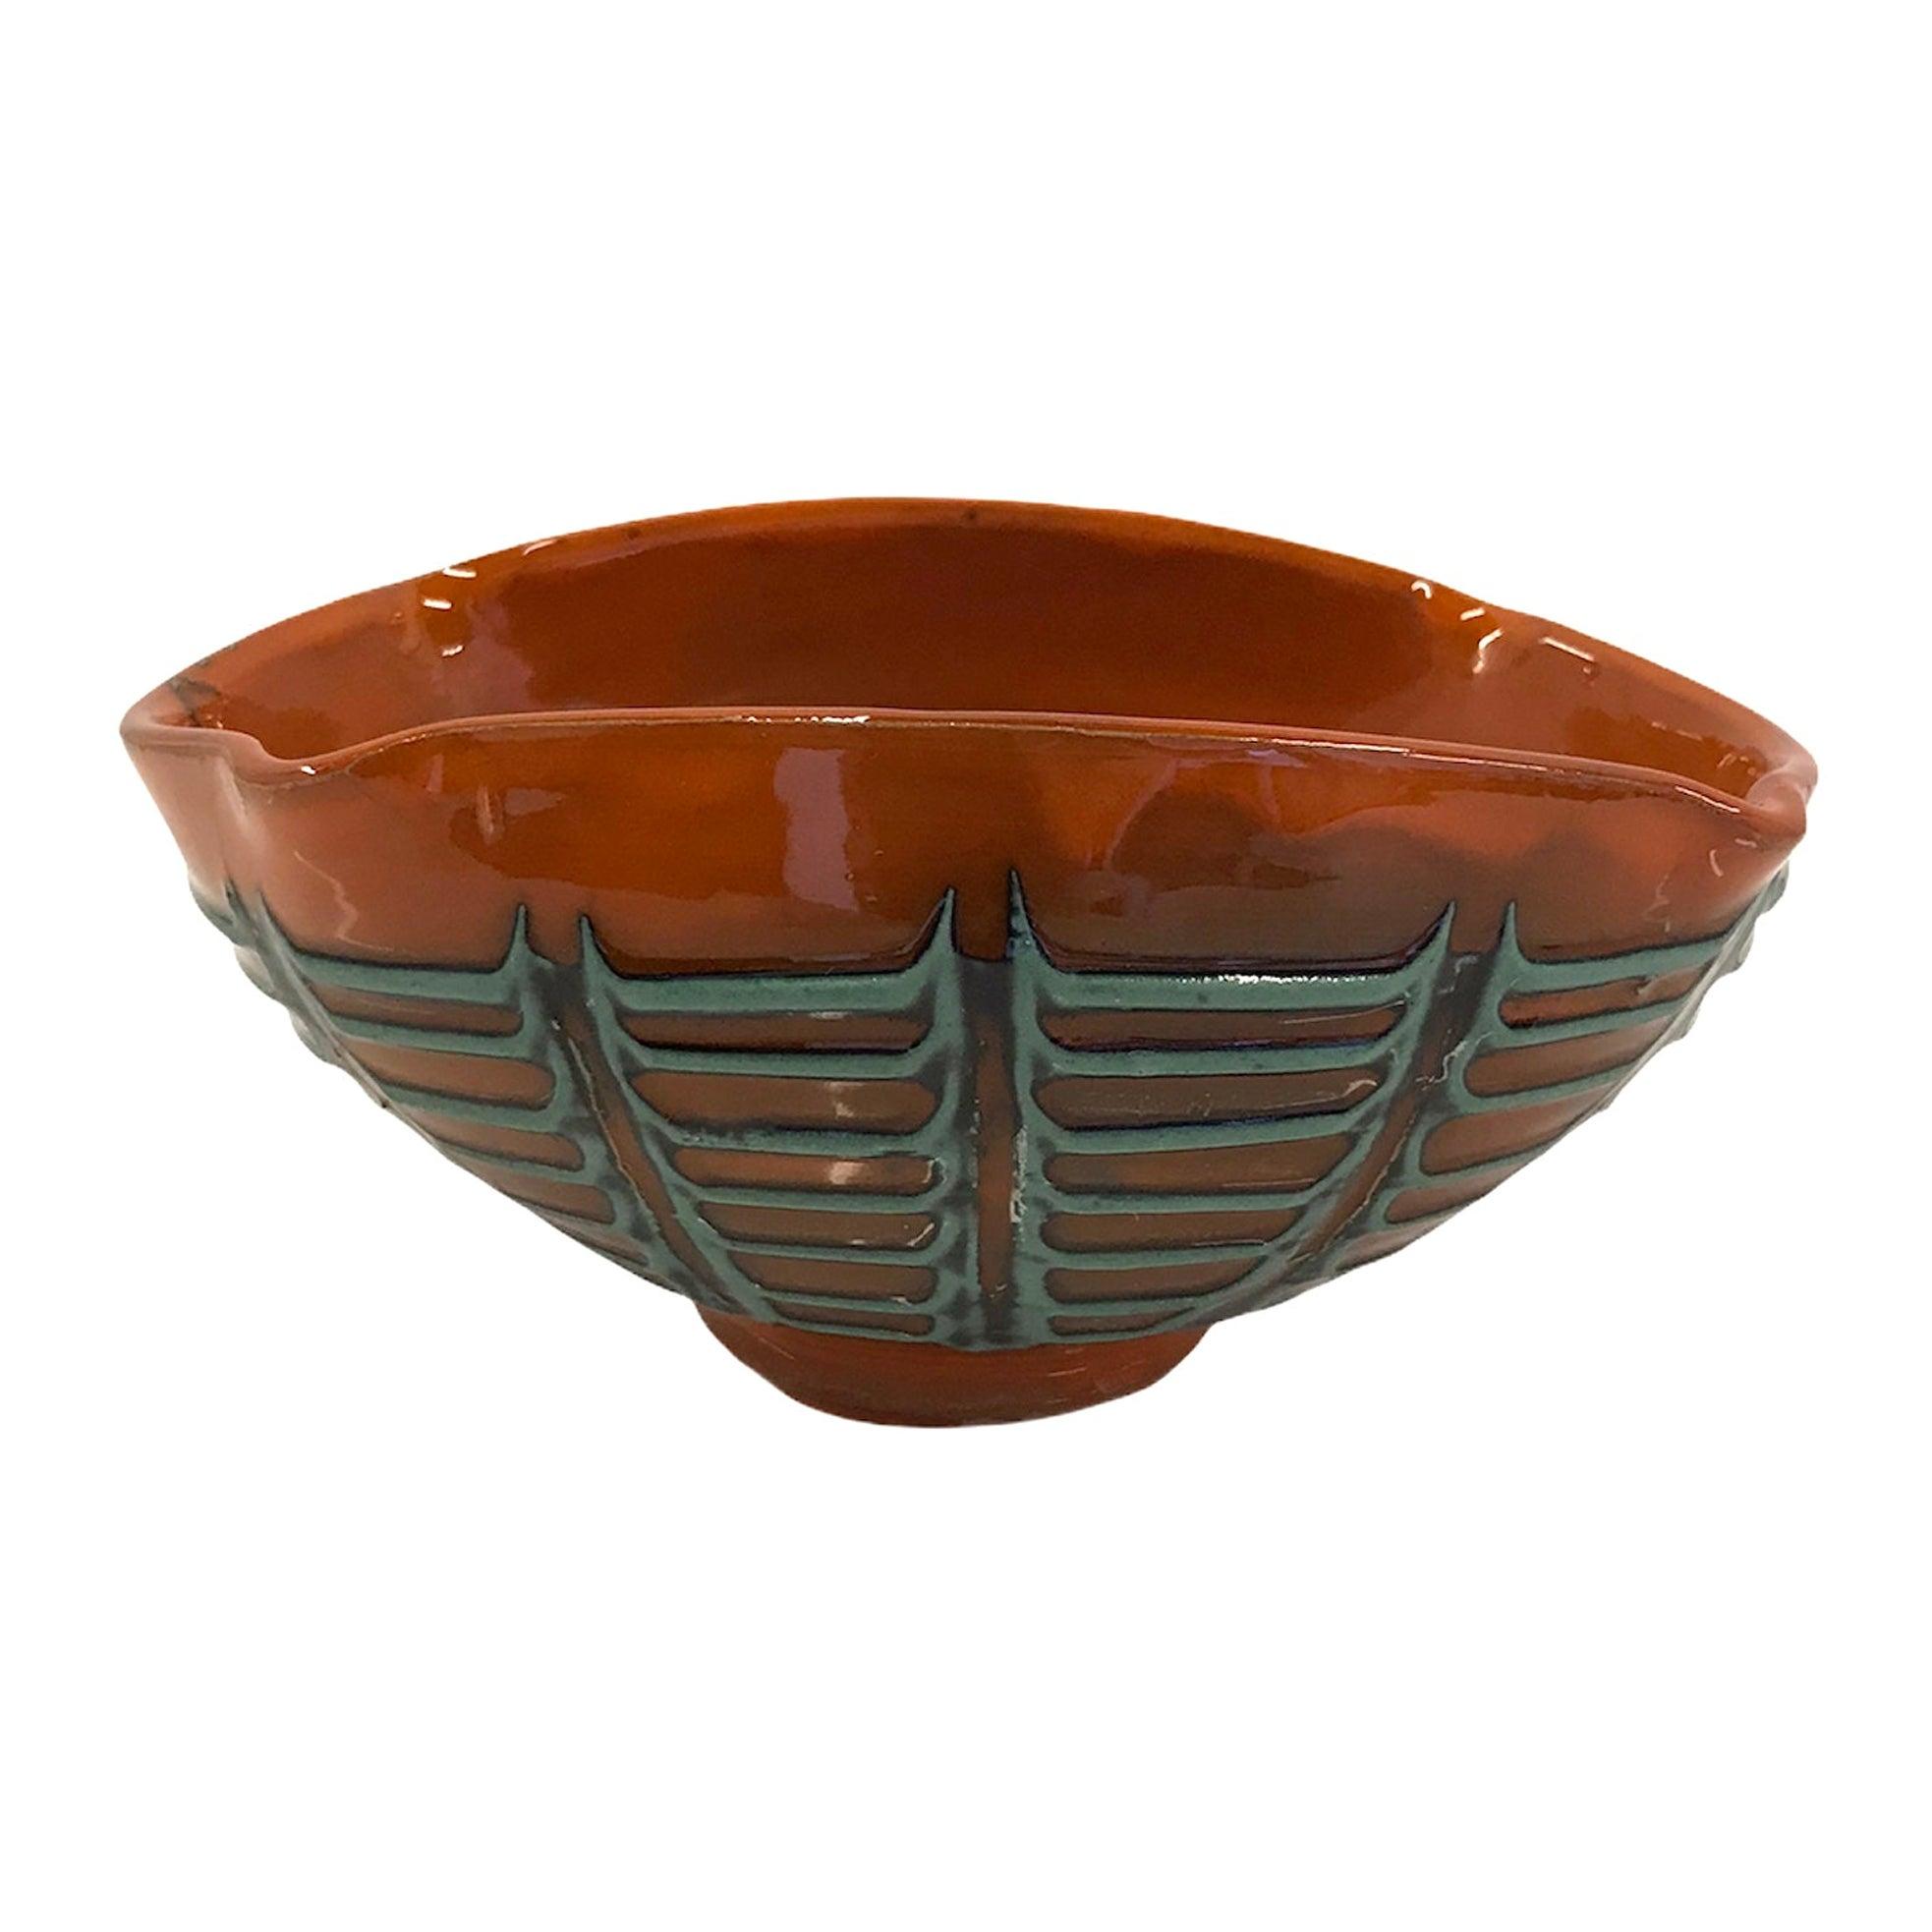 Fratelli Fanciullacci for Melrose Oval Shaped Bowl Italian Modern Bitossi, 1960s